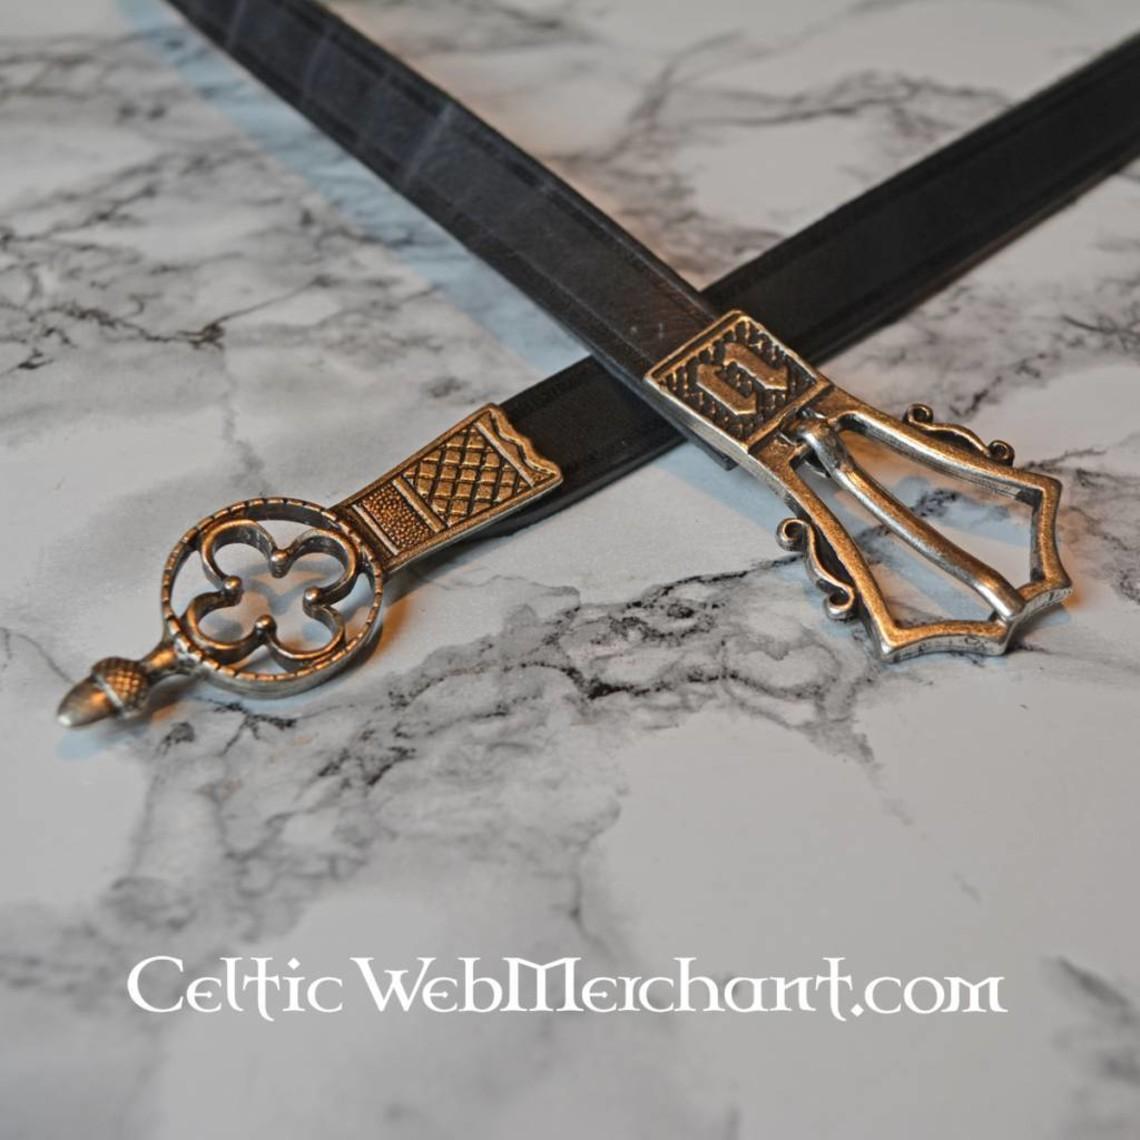 Gotische riem met riemeinde, zwart